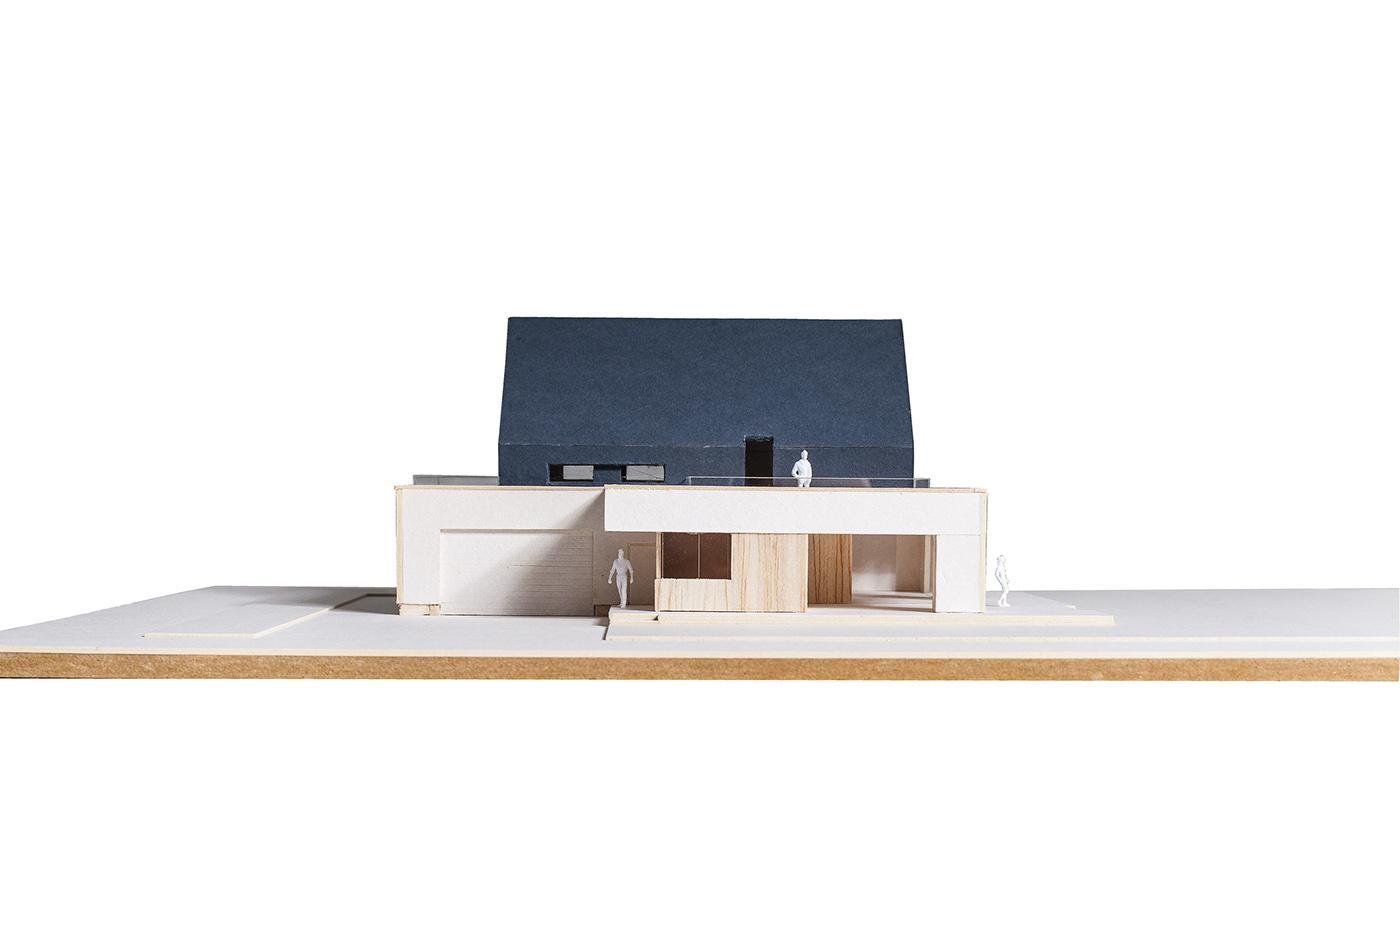 modern house modern barn single family house Wood façade Minimalism individual project Smart House meeko